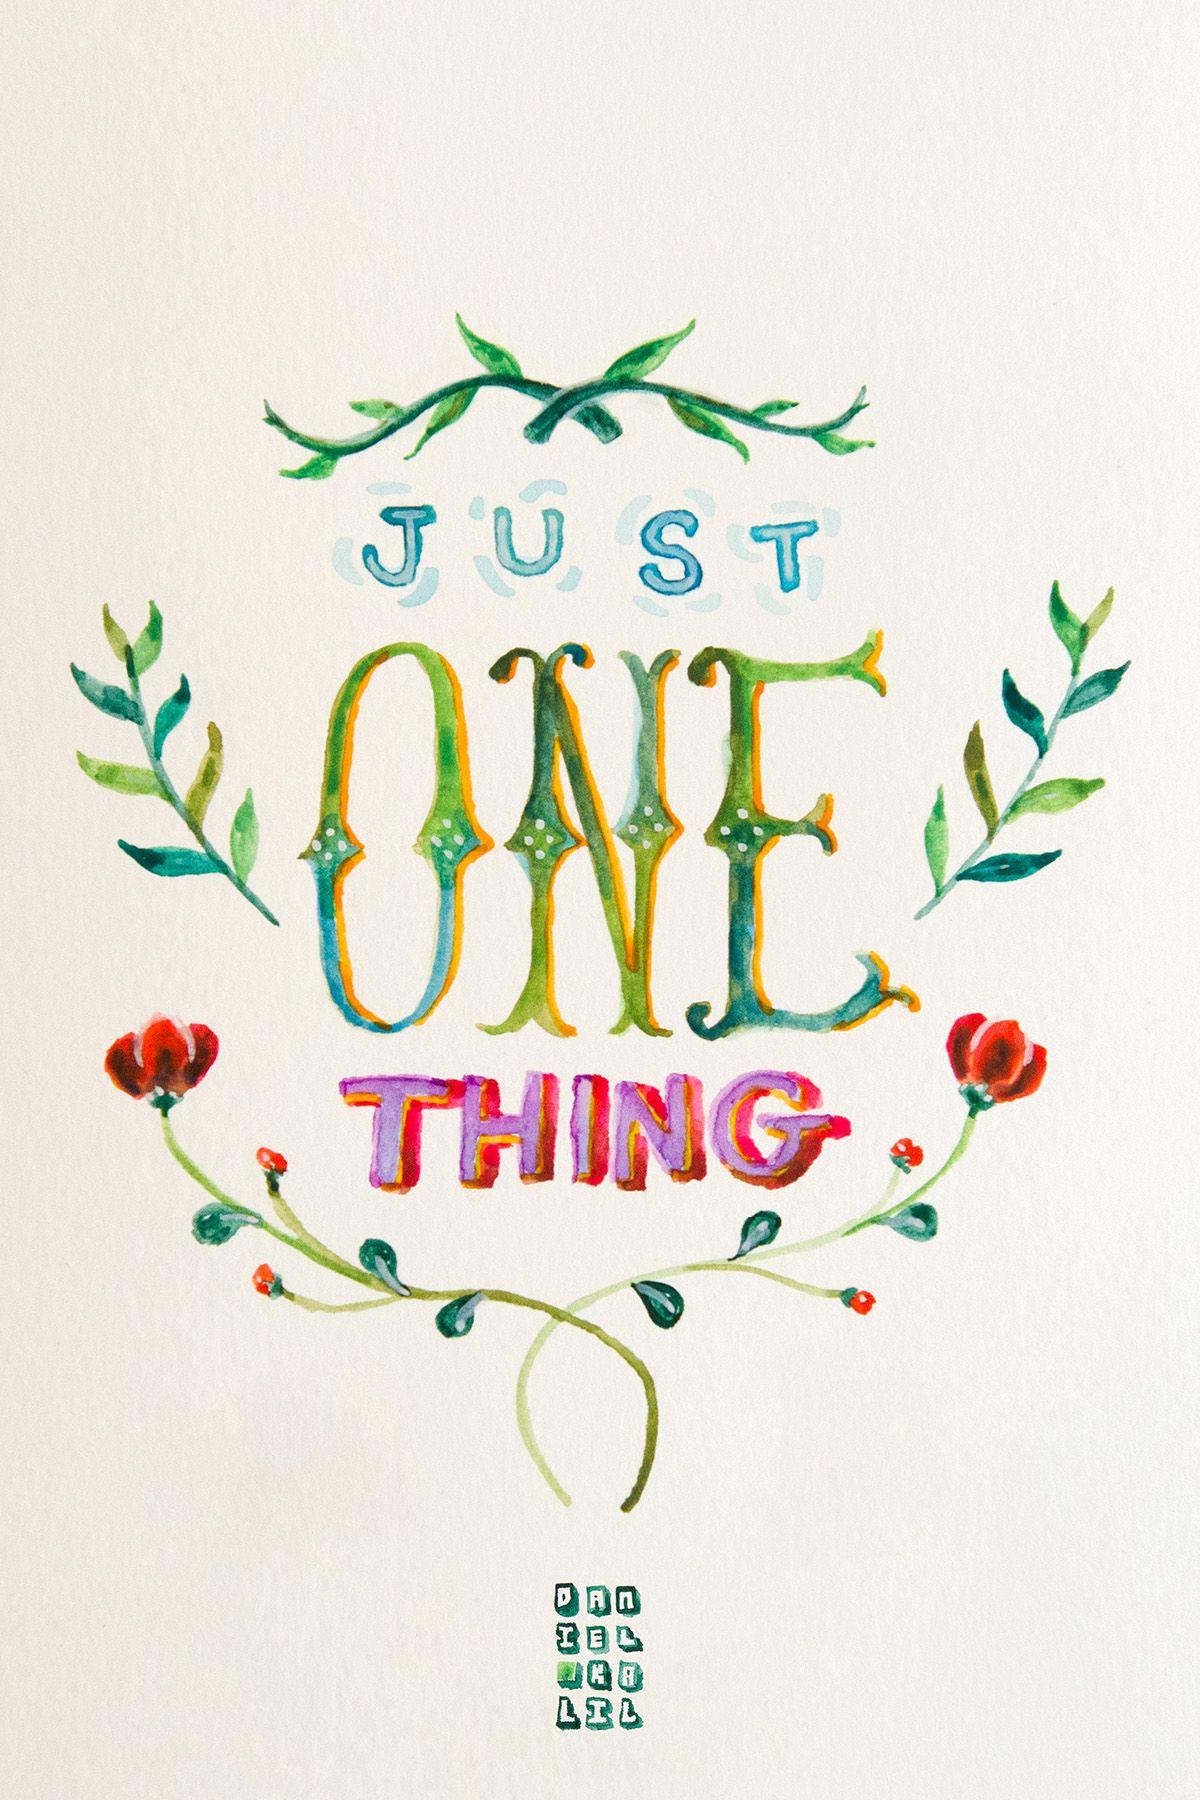 """...just one thing..."" #watercolor #type #aquarela #quotes #umbertoeco"